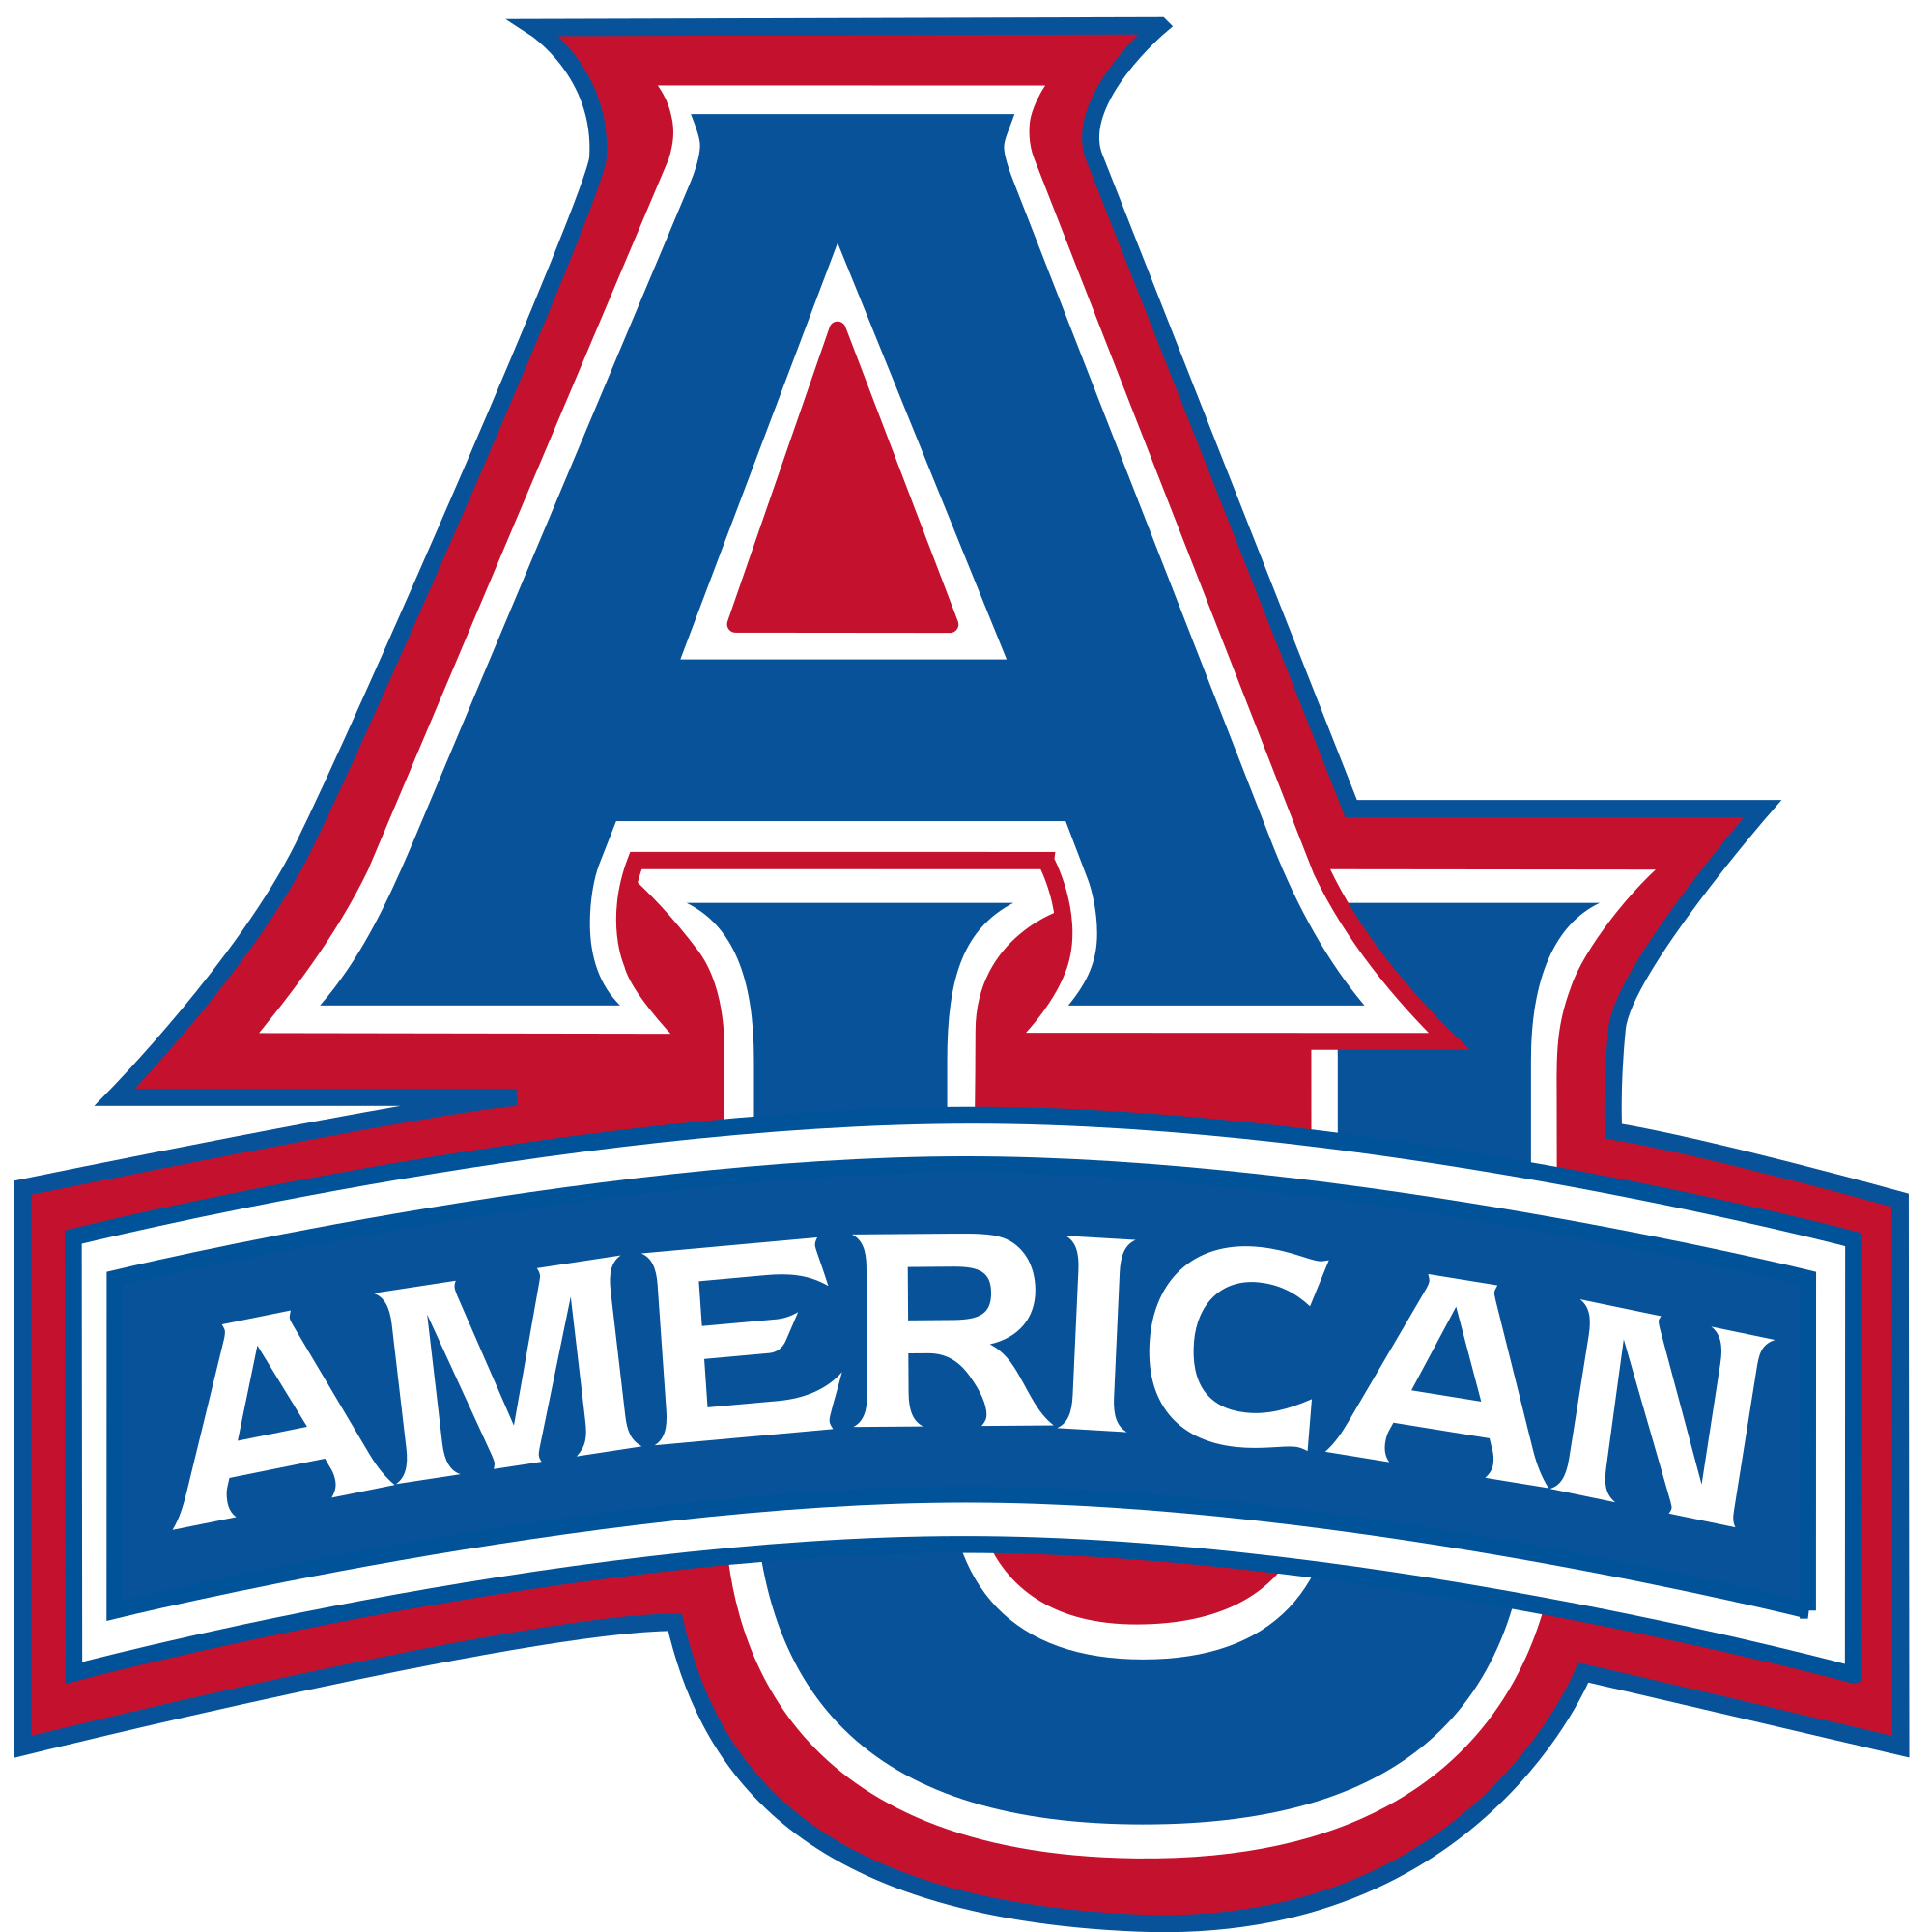 American eagles wikipedia university. Wrestlers clipart wrestling coach